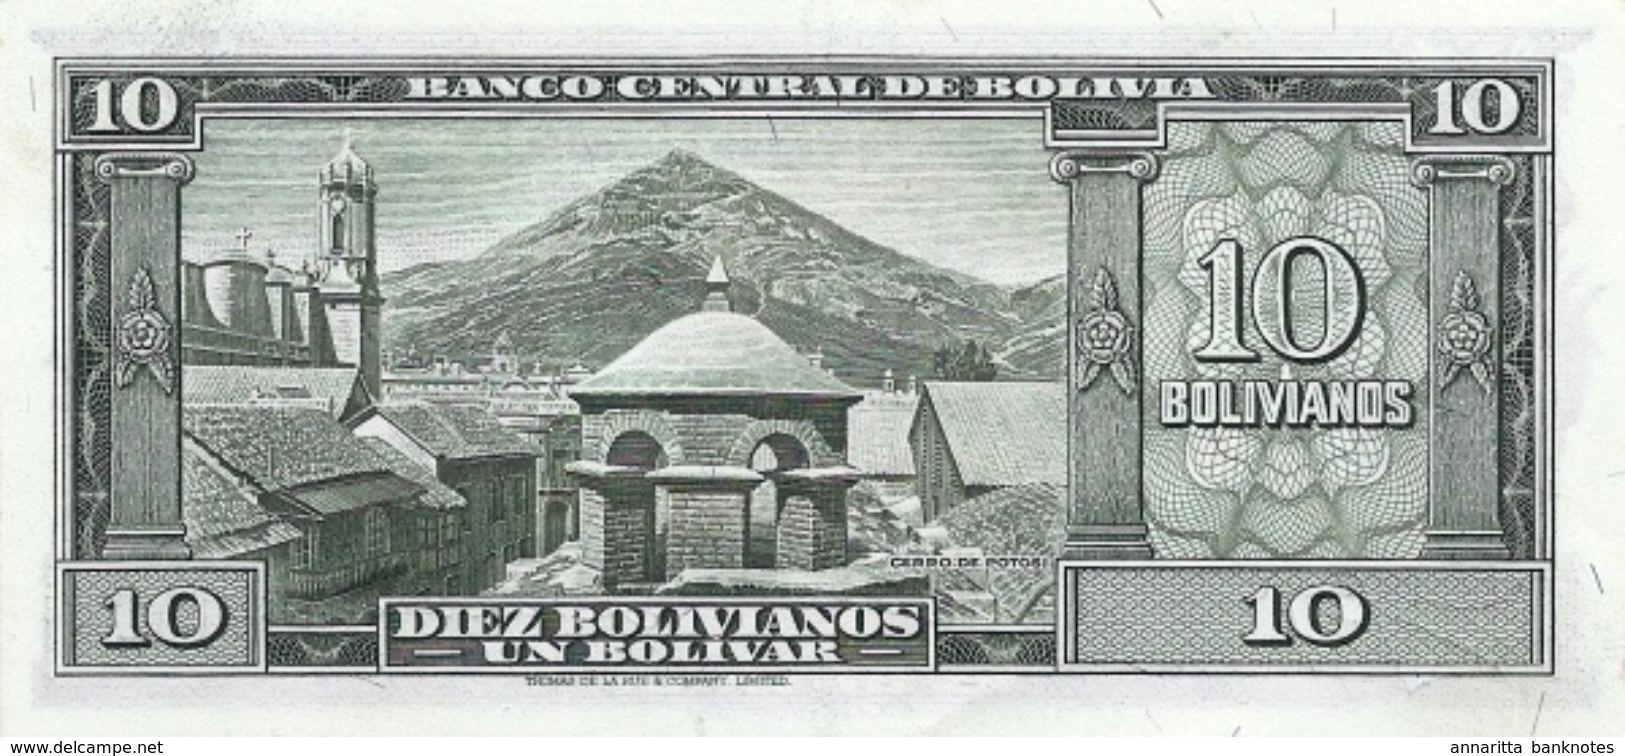 Bolivia (BCB) 10 Bolivianos L. 1945 (1952) UNC Cat No. P-139a / BO328b - Bolivia